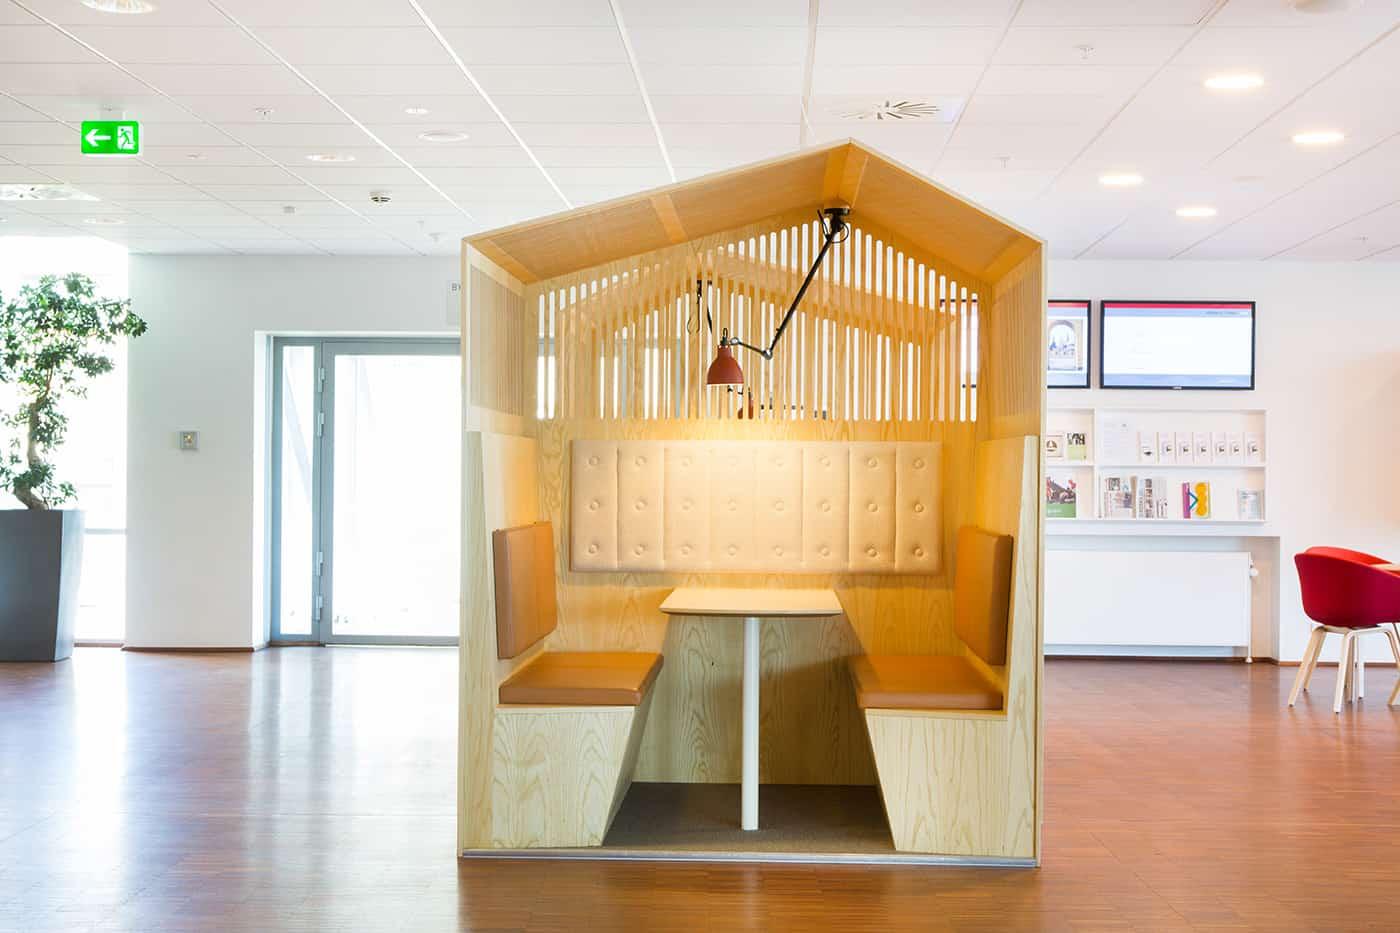 RITAarch, Indretning, spaceplanning, Borgerservice, Borgerservice Roskilde Rådhus, wayfinding, grafik, spaceplanning, arkitektur, Specialinventar, specialdesign, rum i rummet